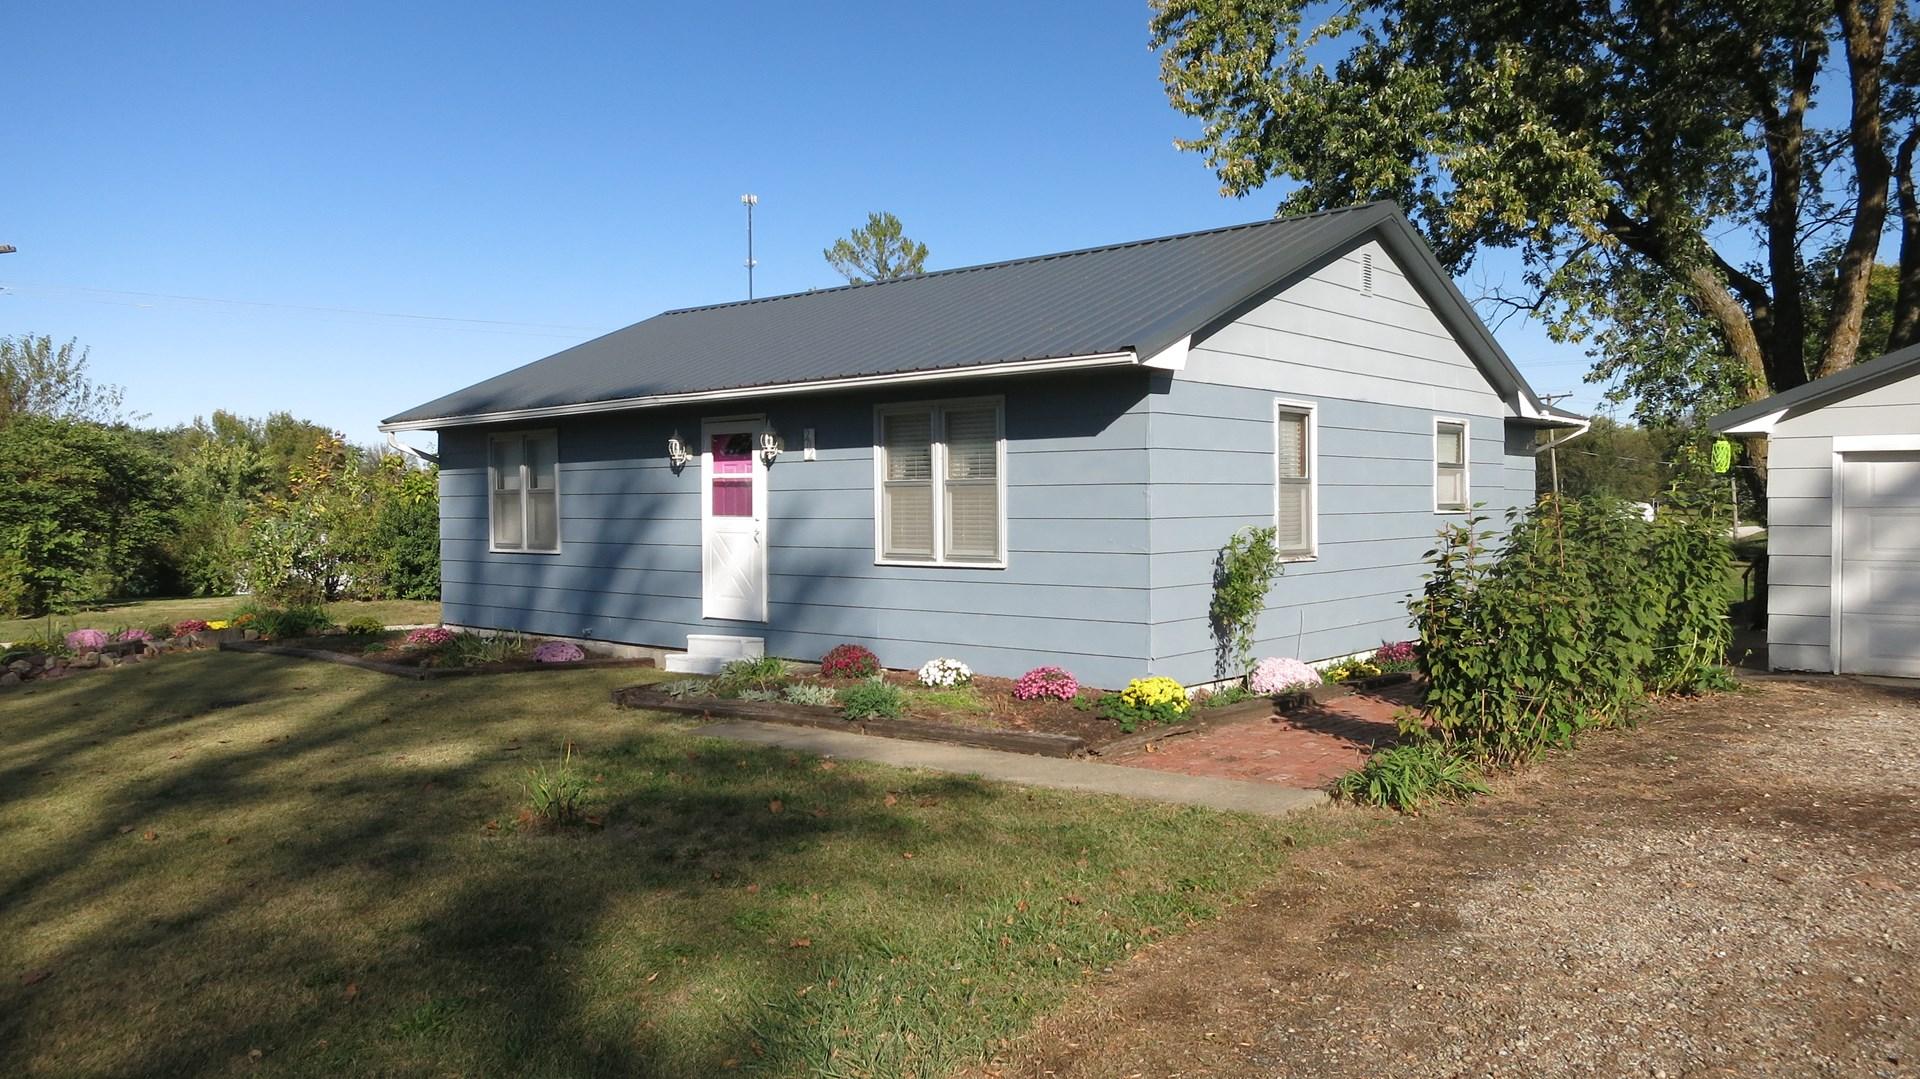 Ranch Home in Ridgeway For Sale